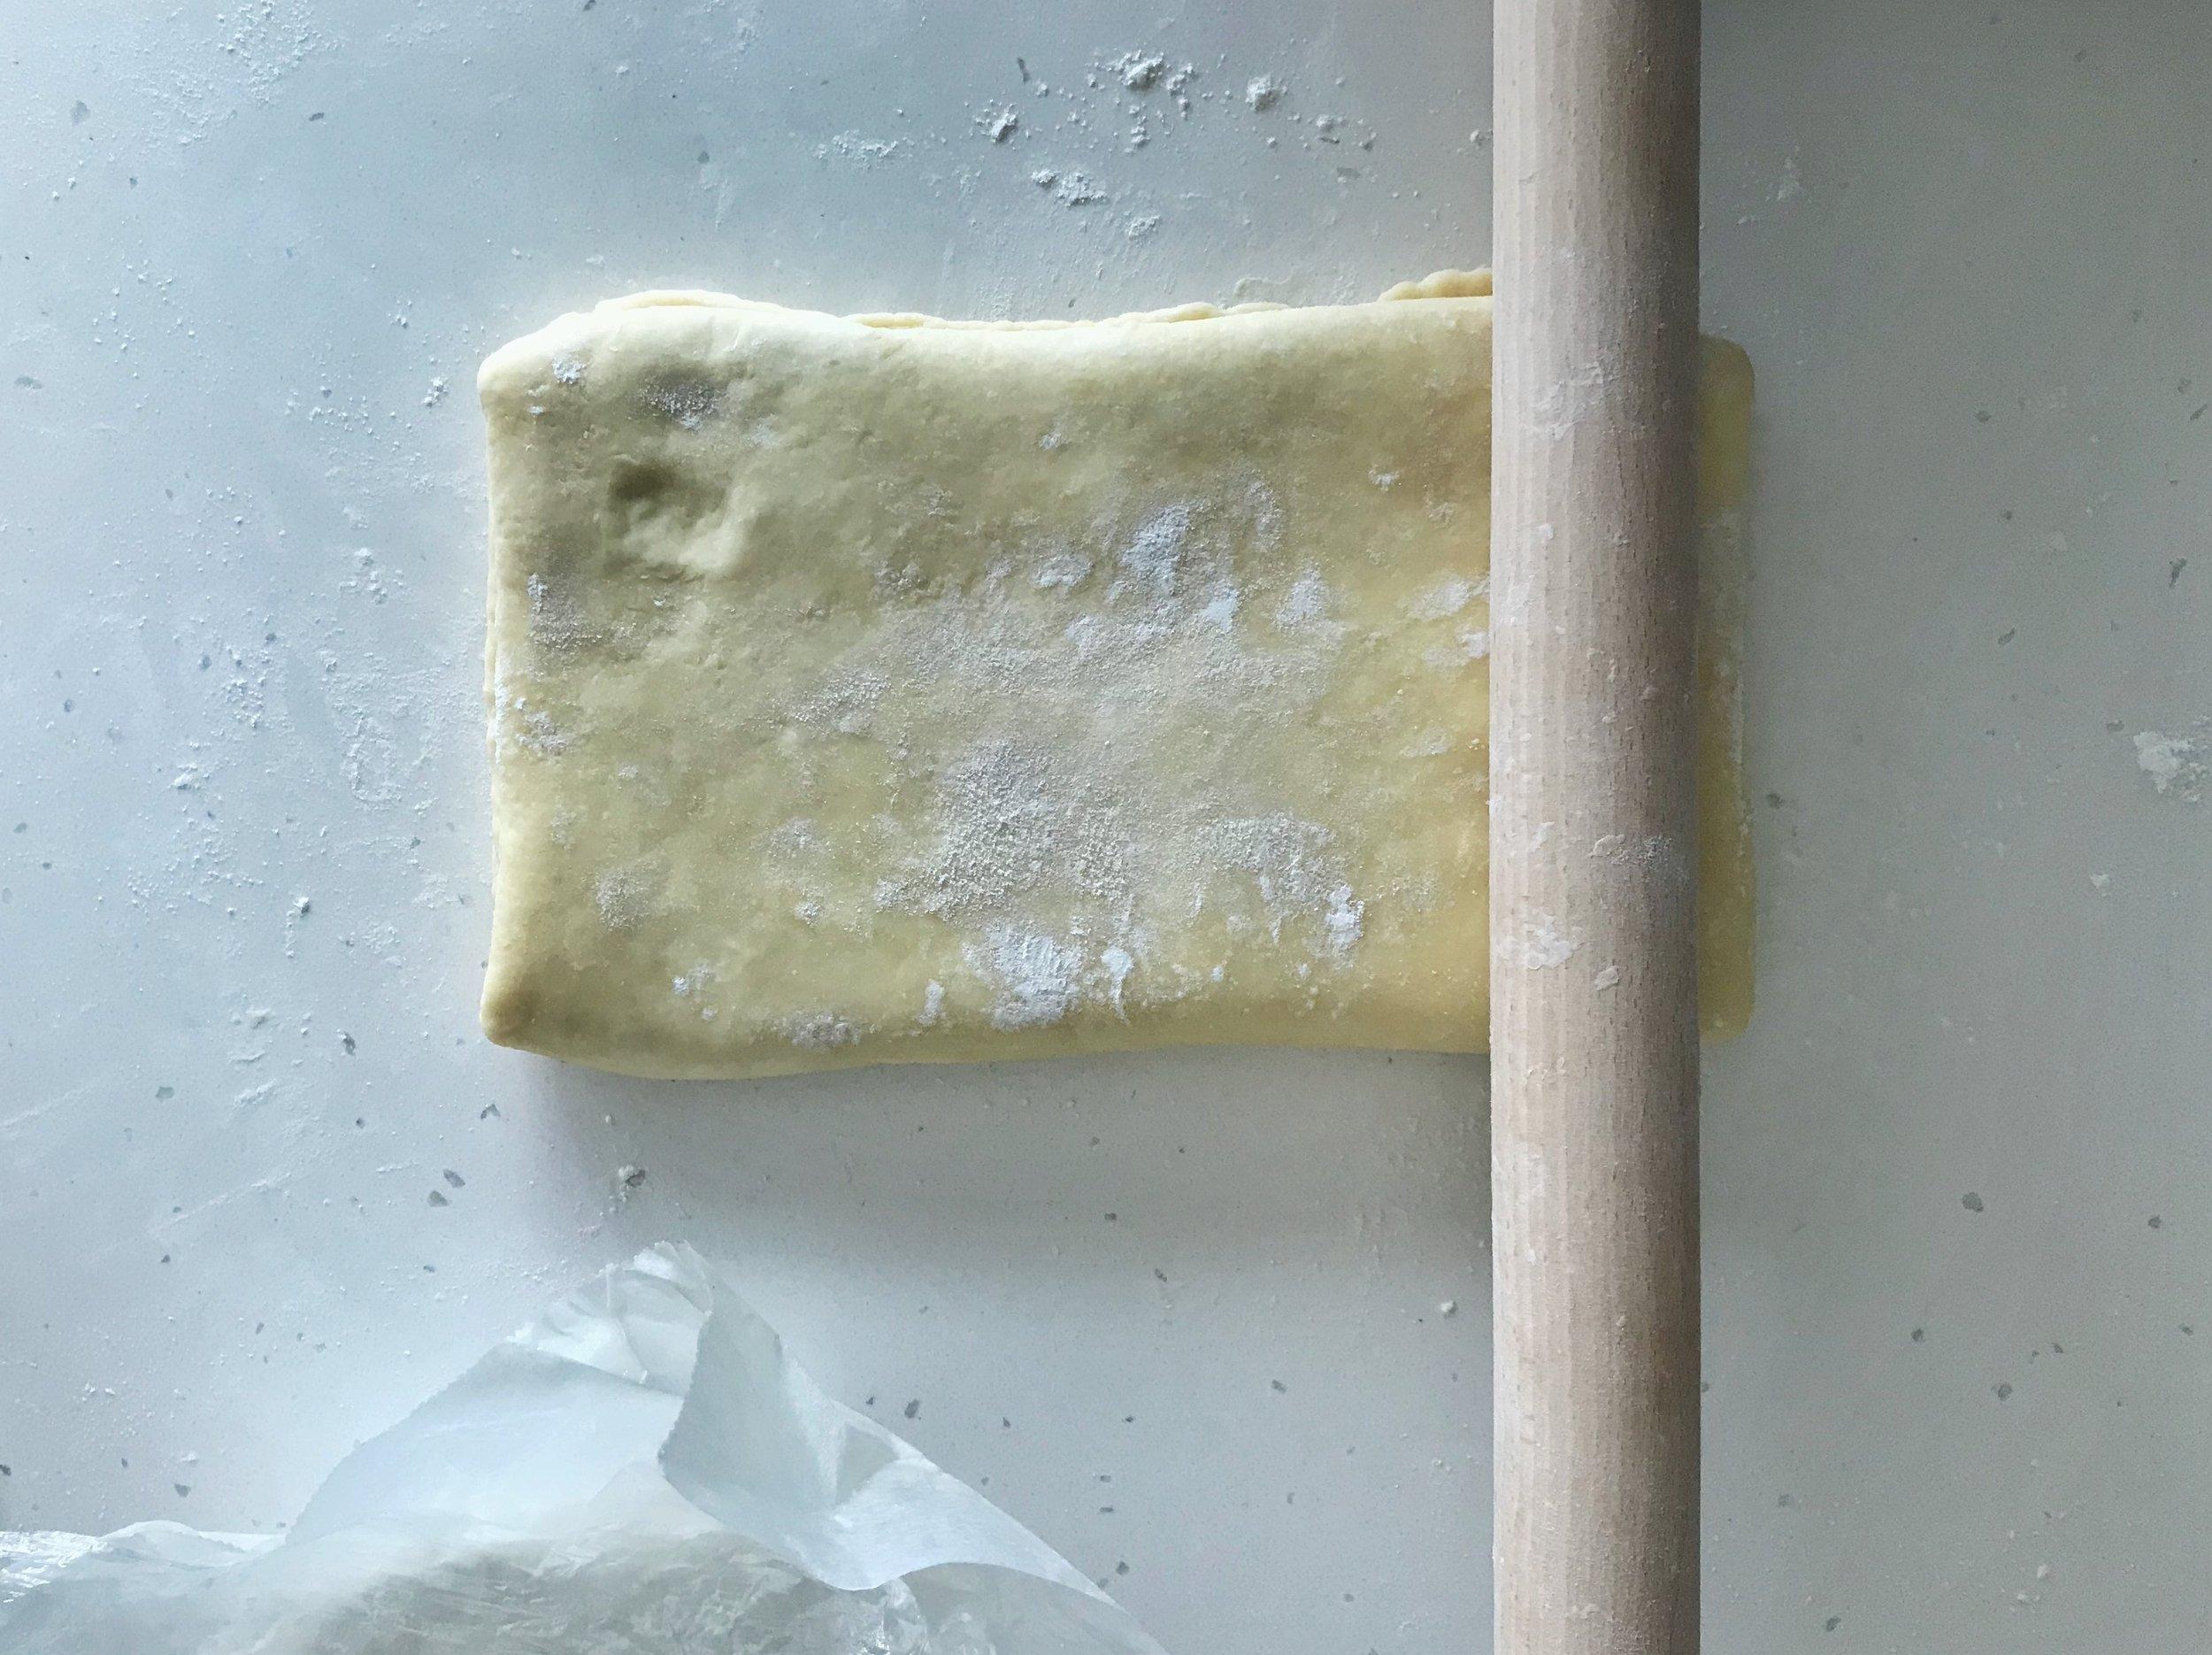 24hourkitchen-kitchenbasics-recipe-danish-pastry-dough-vienoisserie-laminated-snail